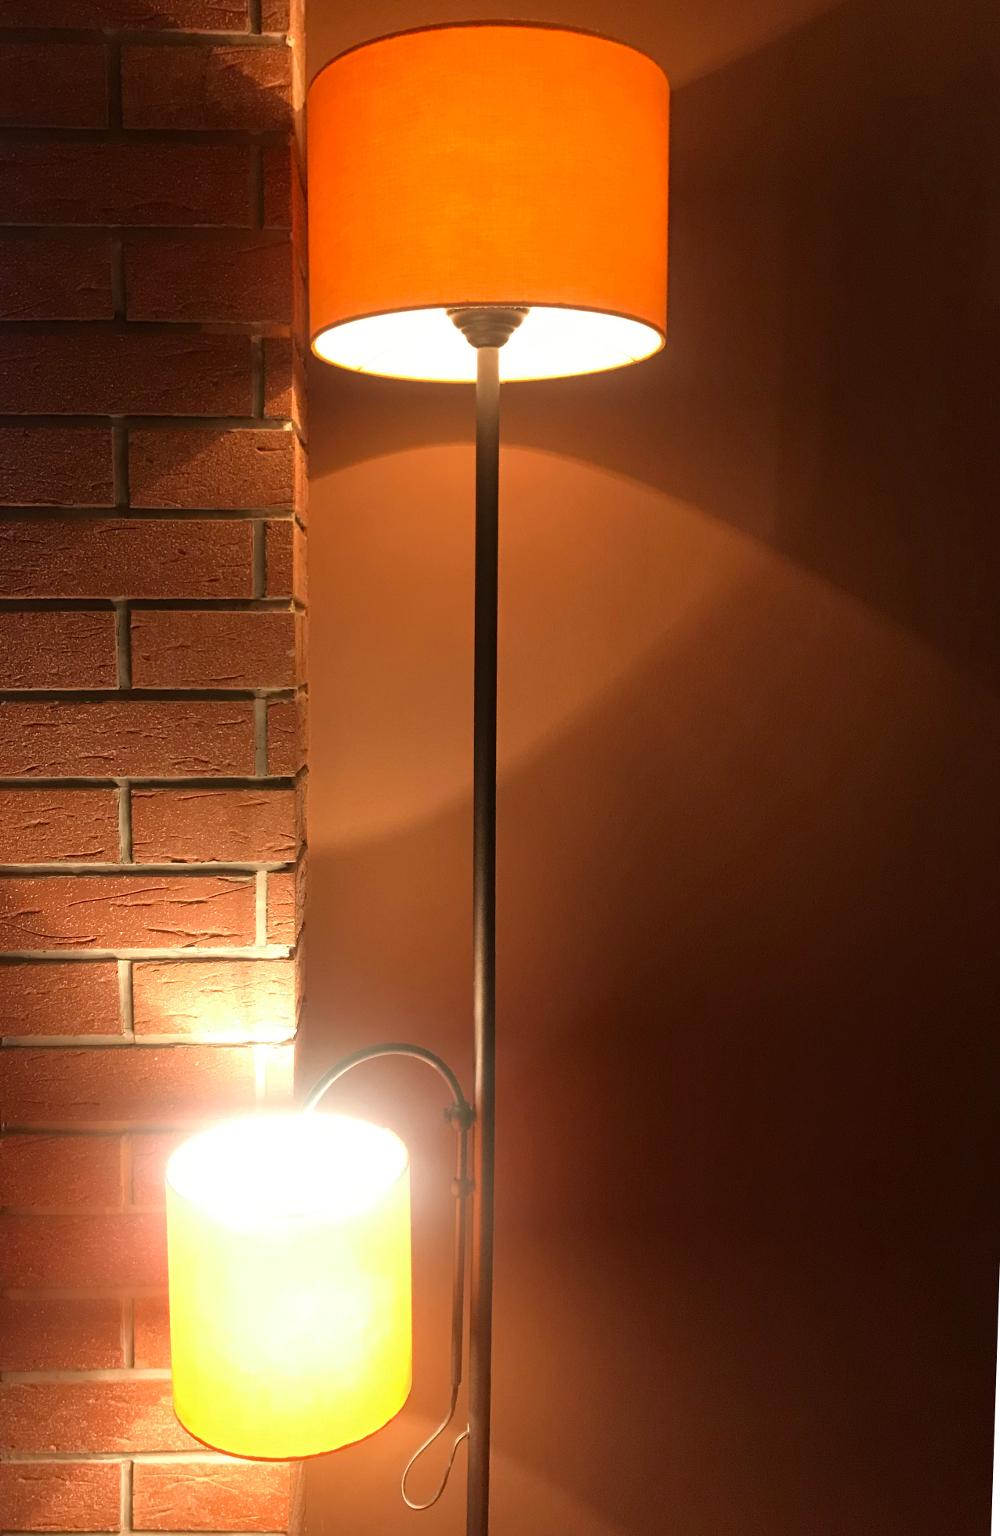 žluté stínidlo na lampu